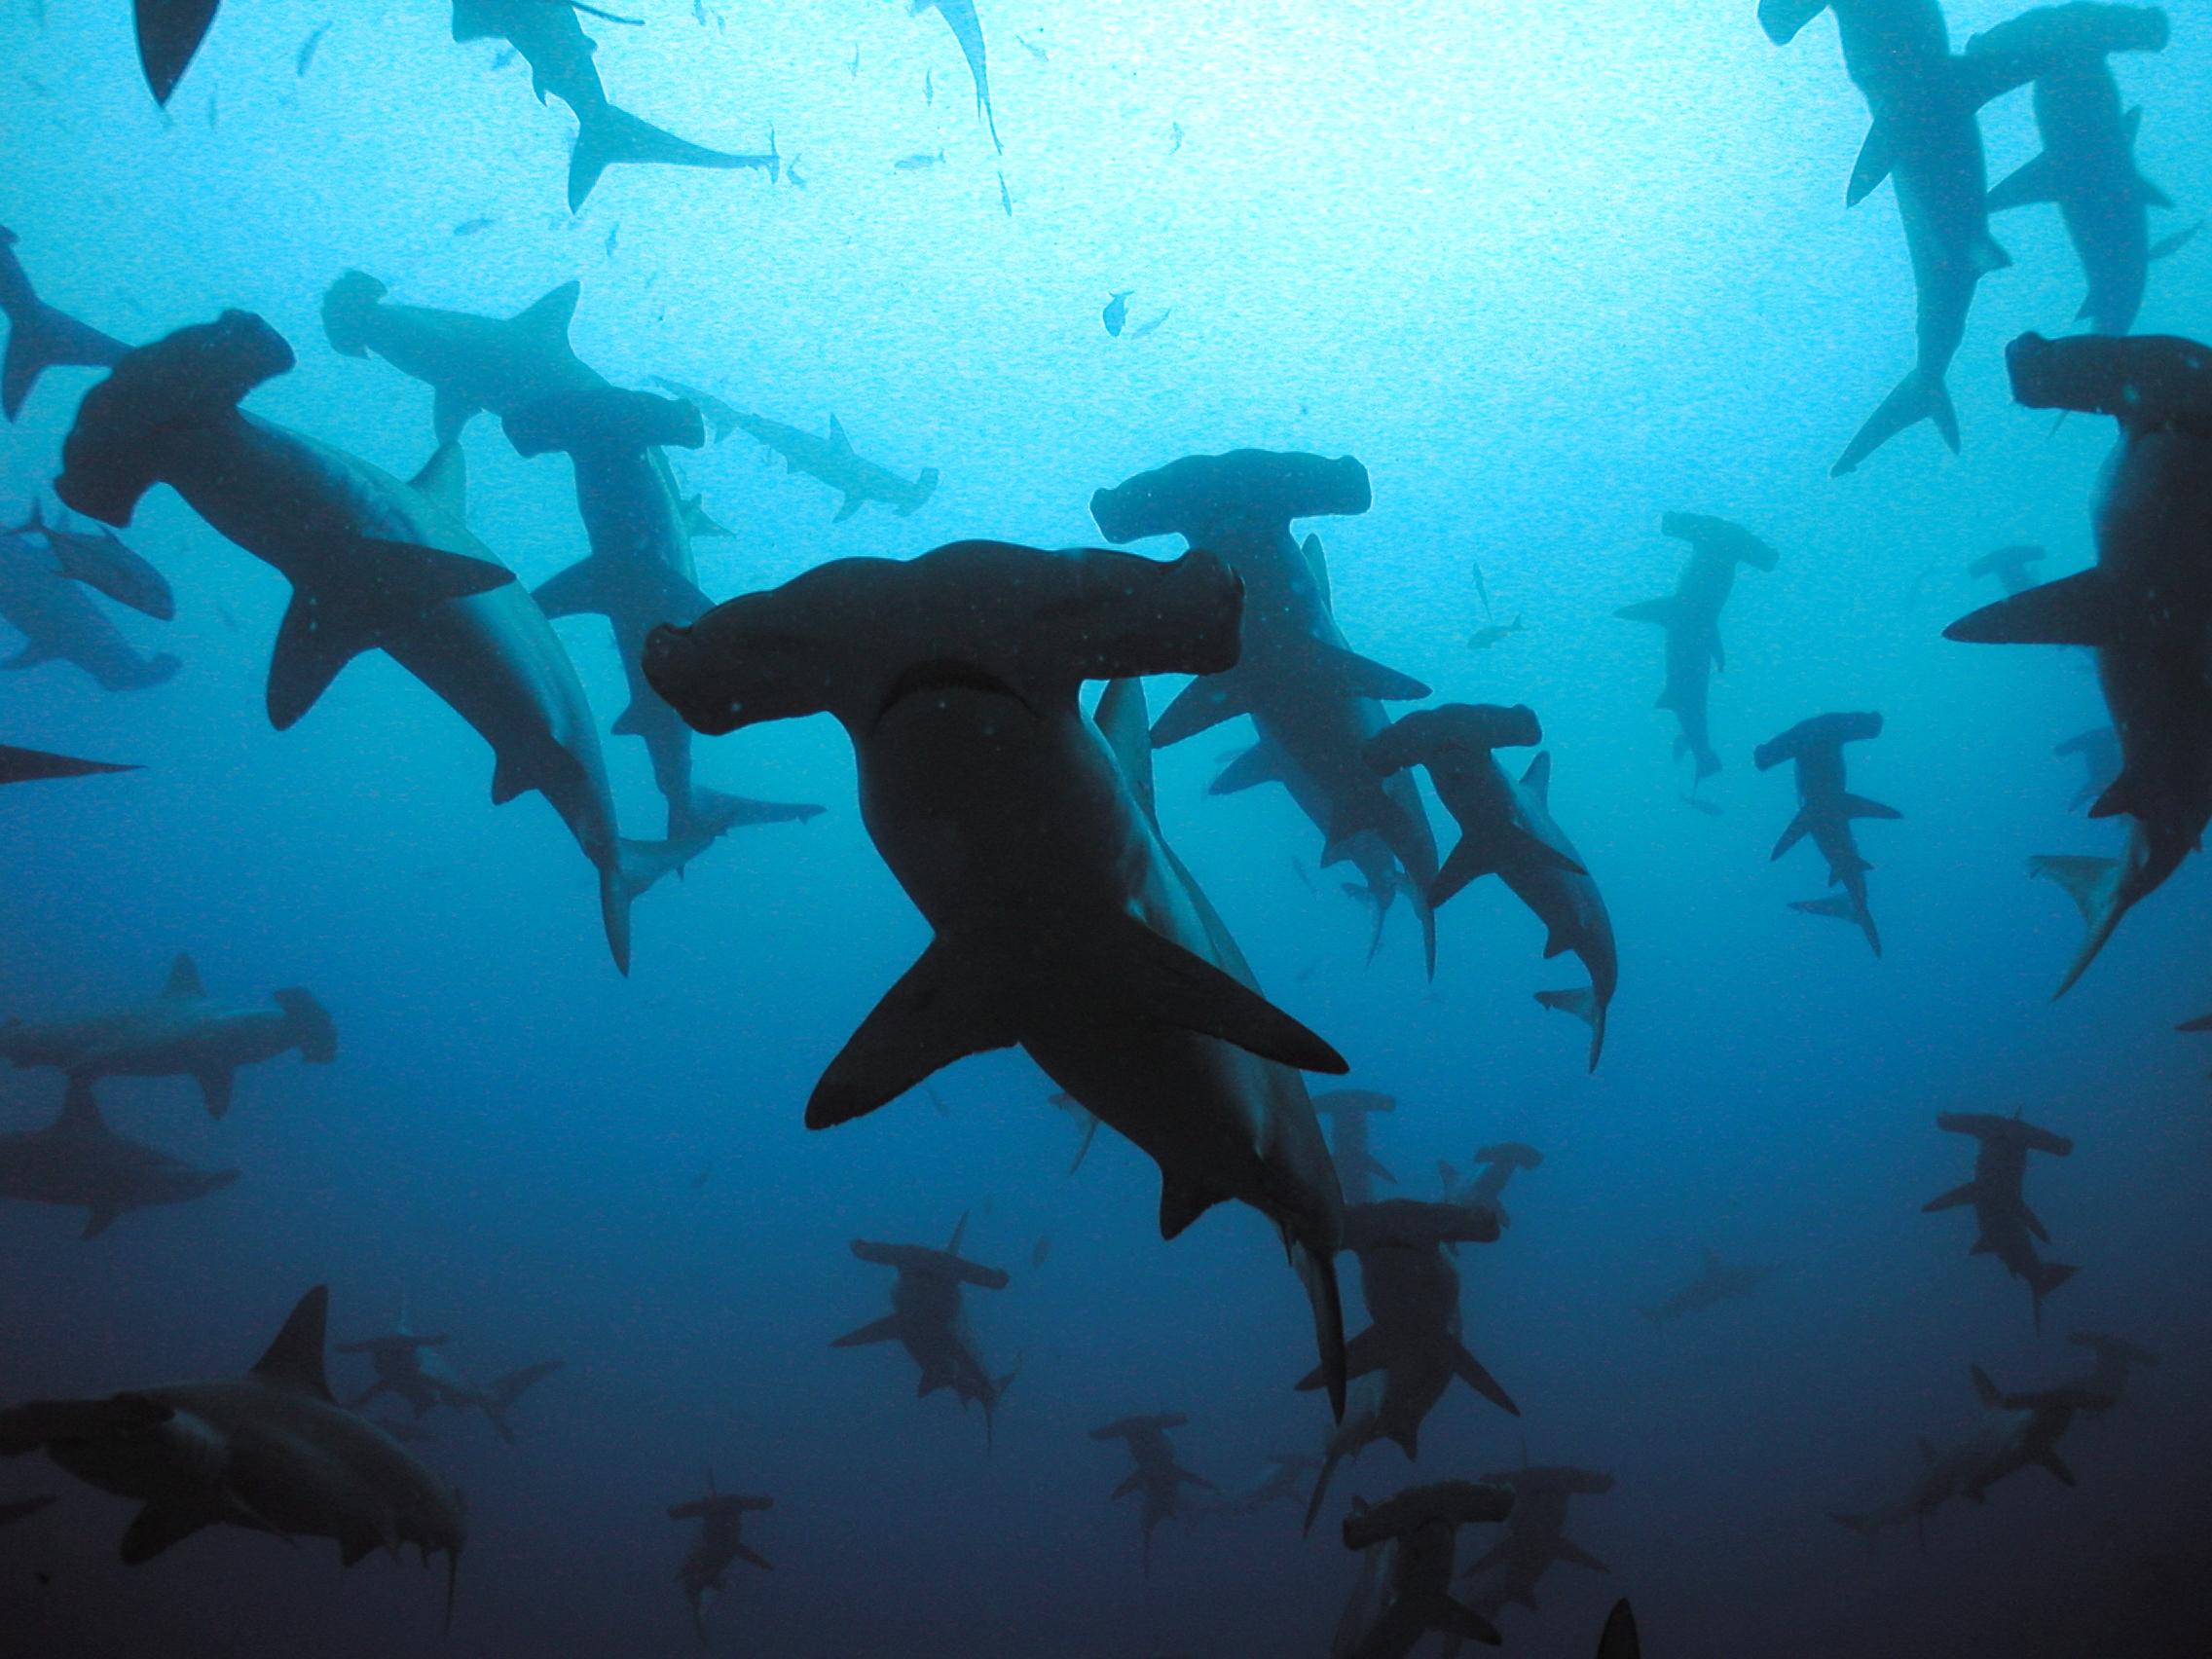 Hammerhead clipart great white shark  Great Clipart Shark wallpaper